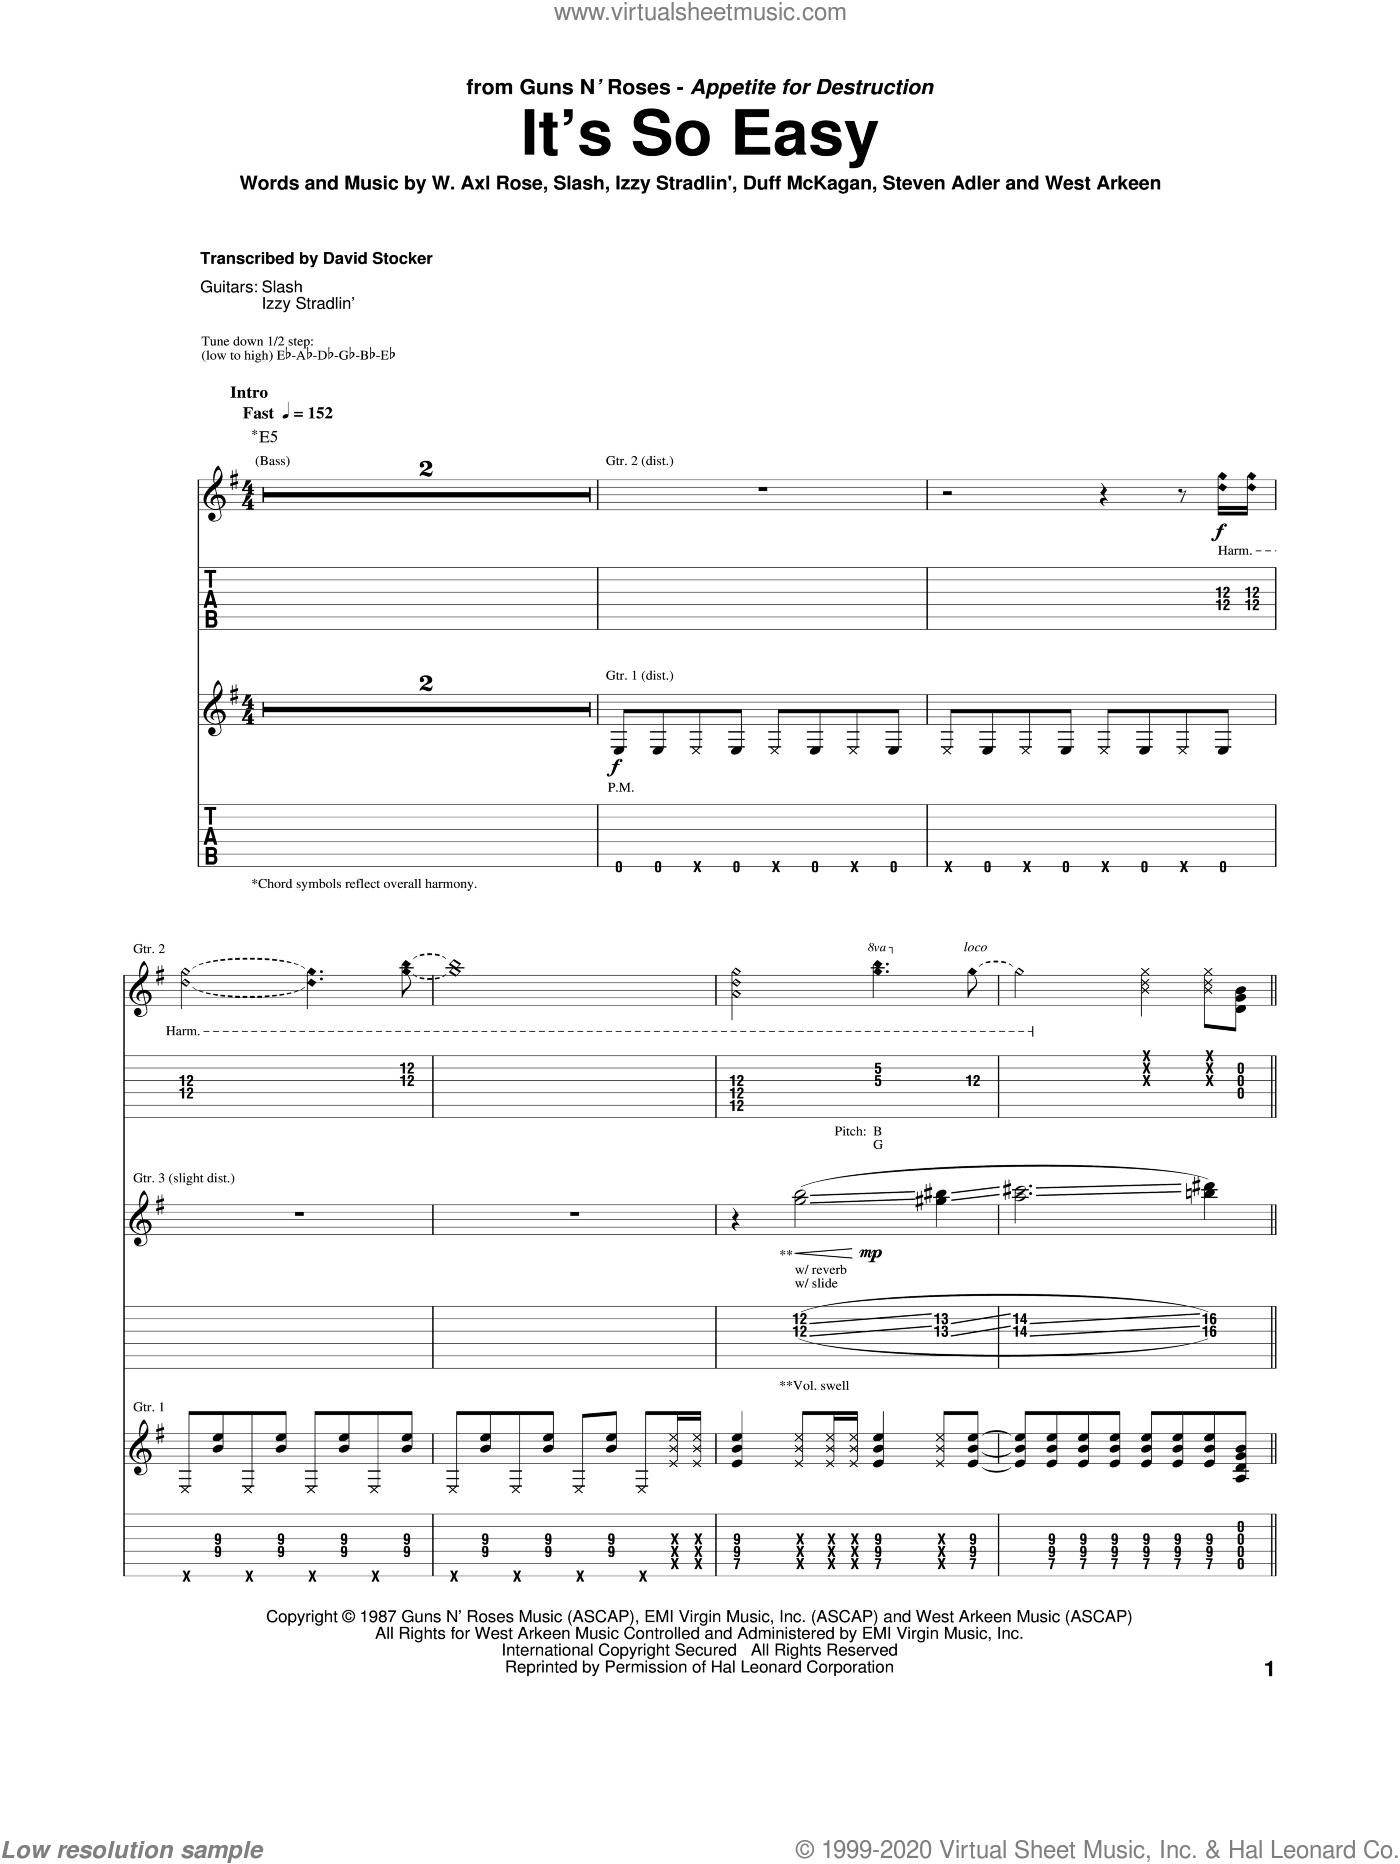 It's So Easy sheet music for guitar (tablature) by Guns N' Roses, Axl Rose, Duff McKagan, Izzy Stradlin, Slash, Steven Adler and West Arkeen, intermediate skill level